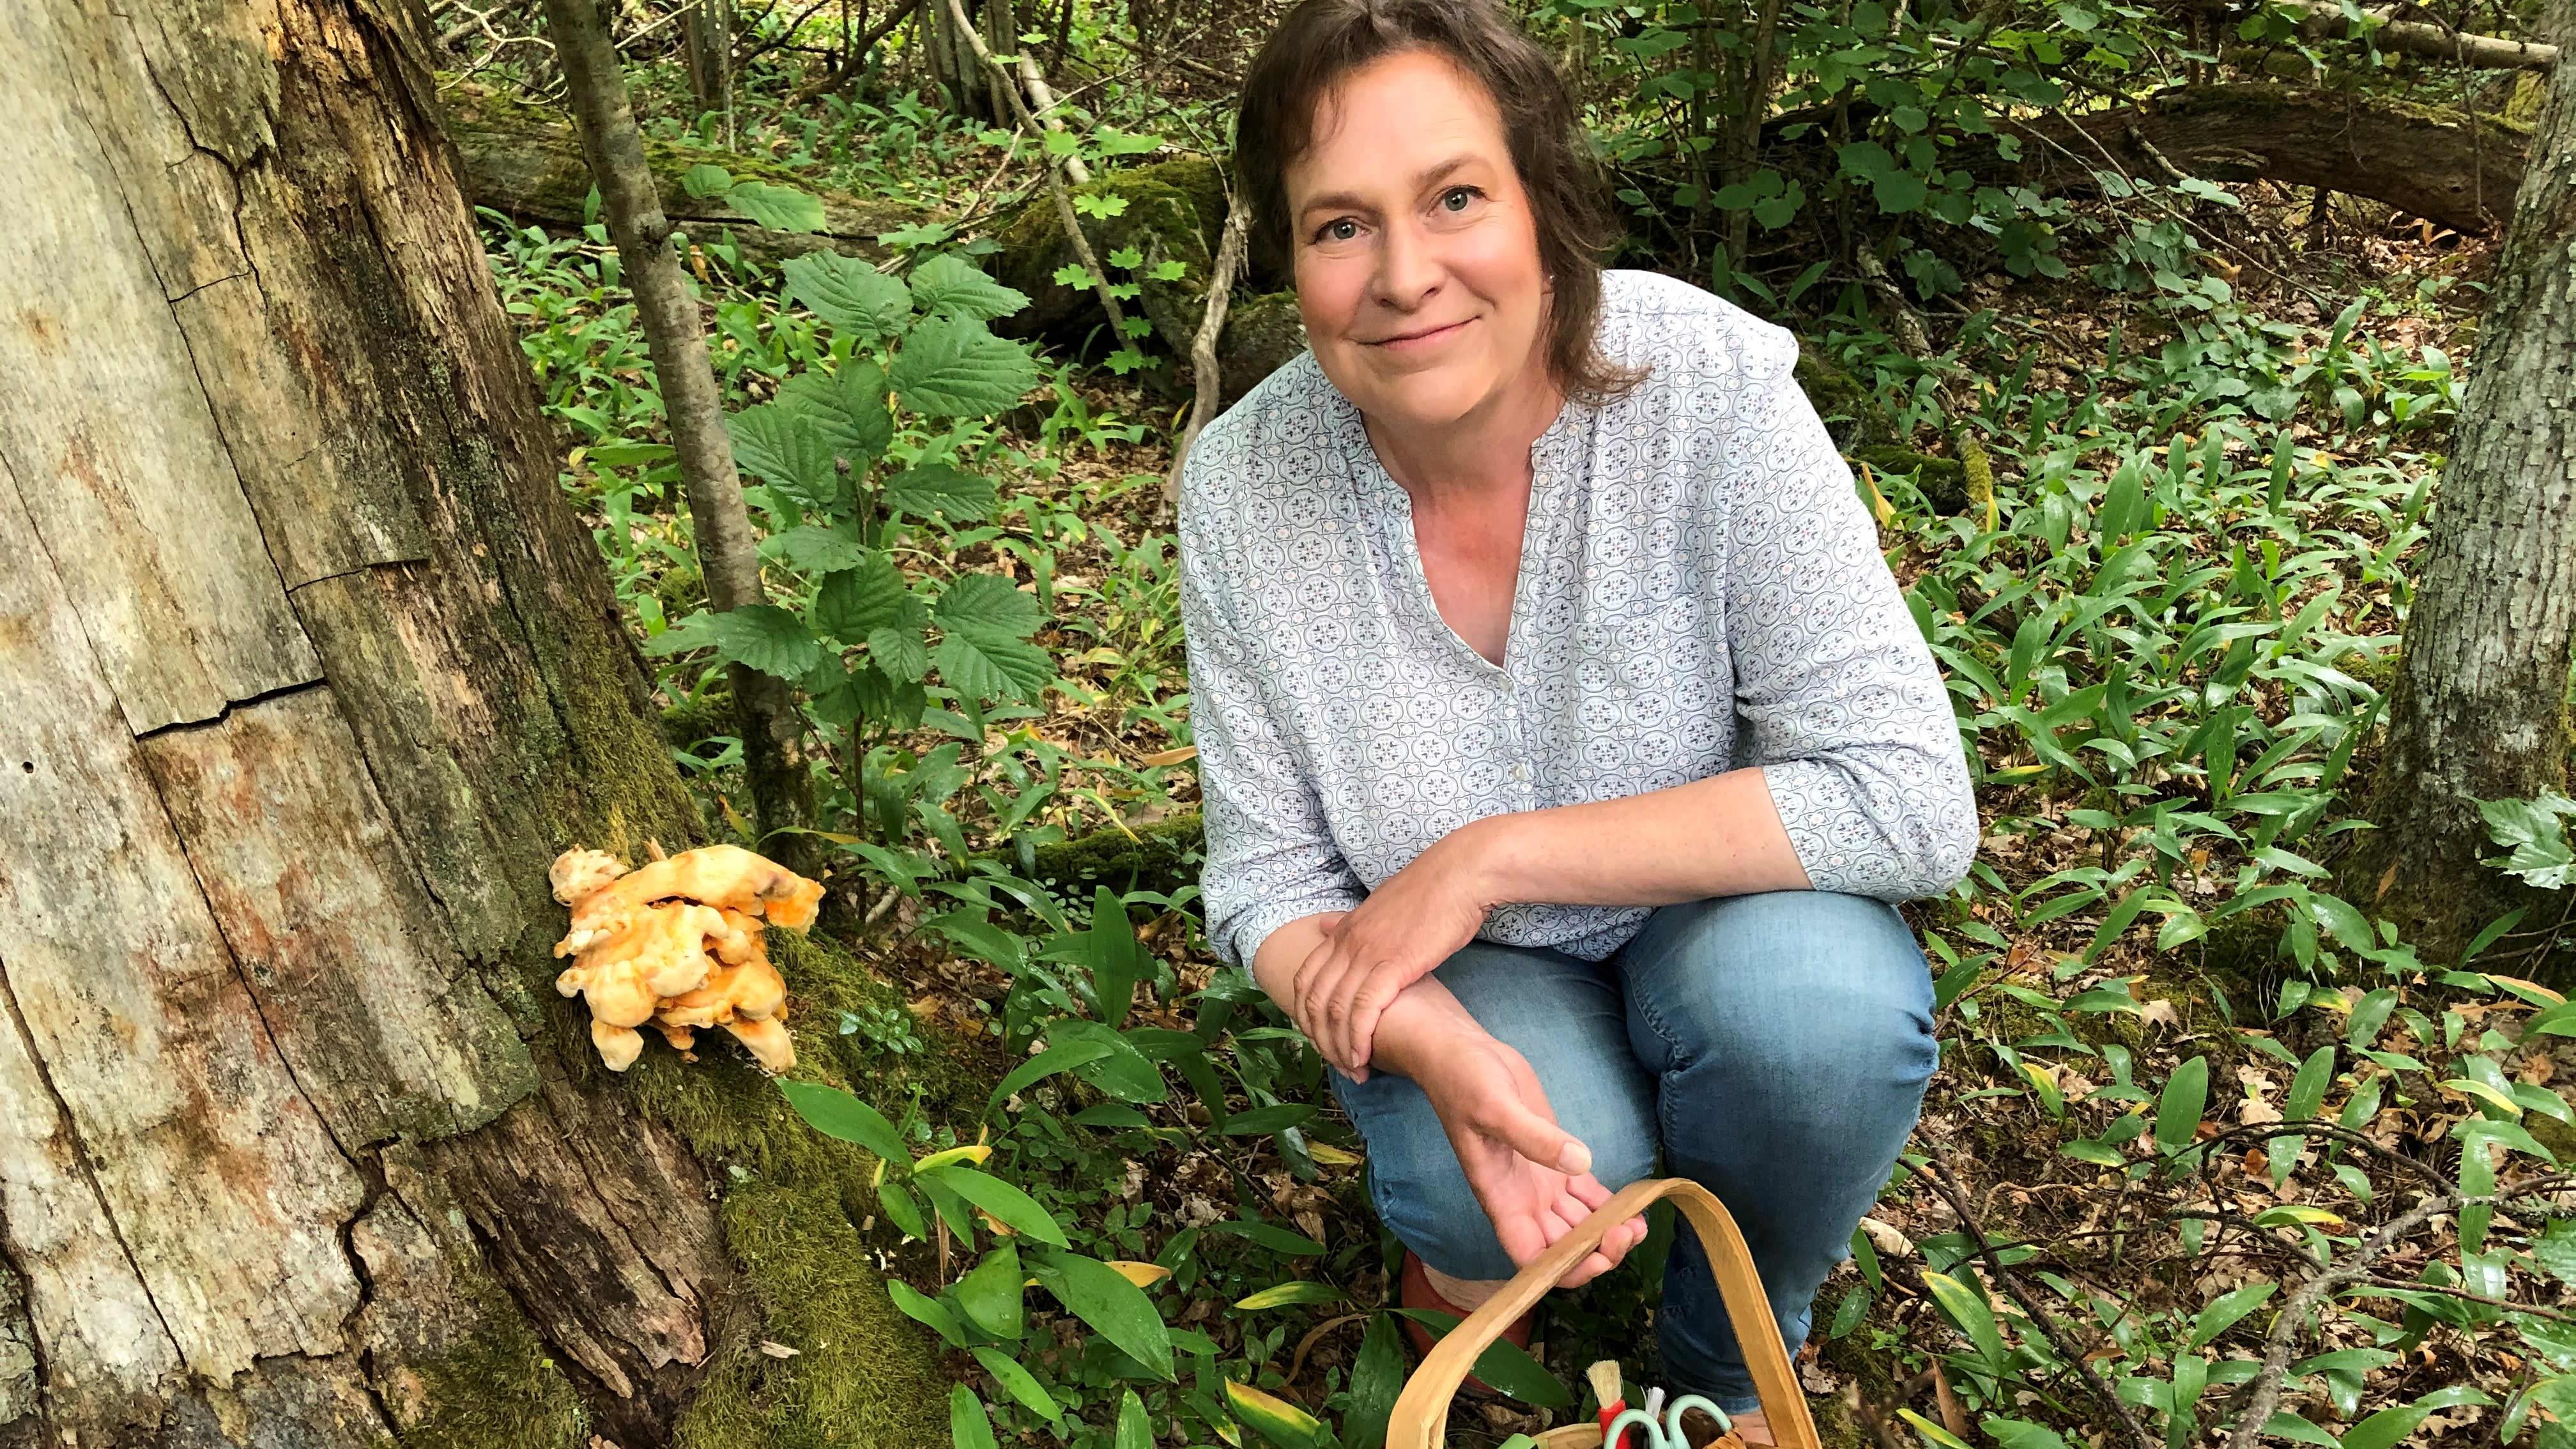 Sienisadossa on suuria paikallisia eroja